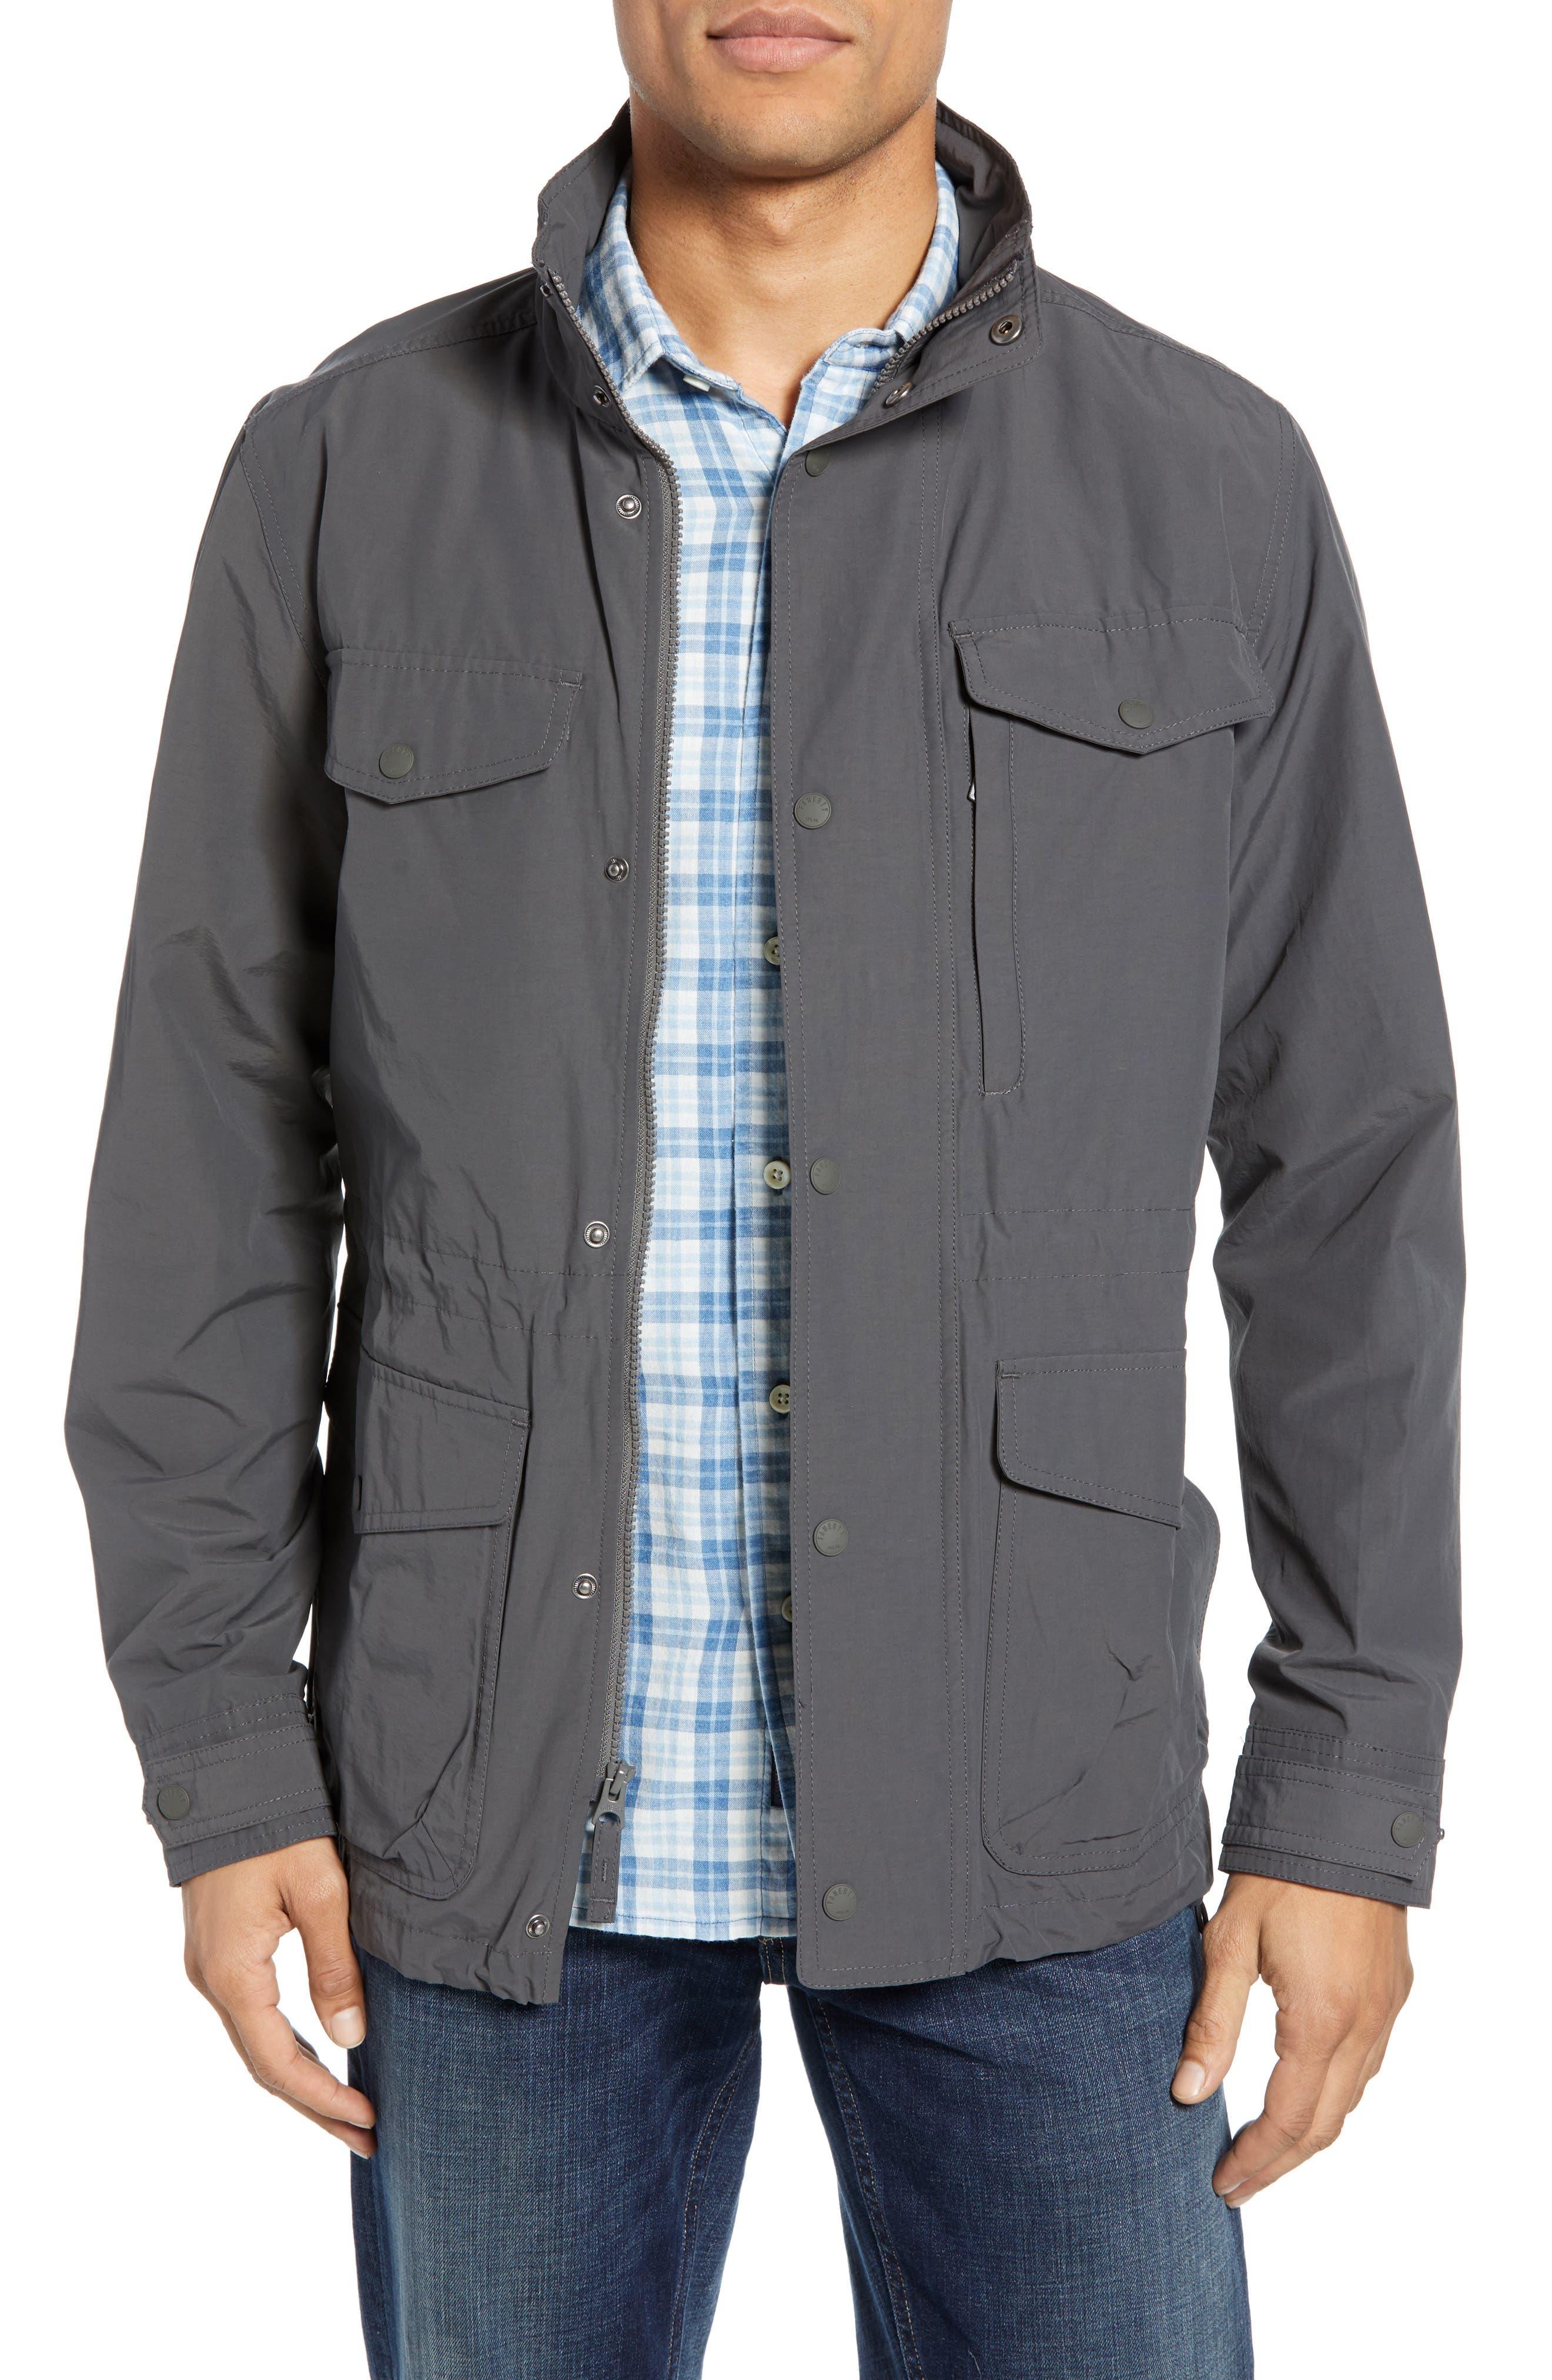 Faherty 60/40 Water Resistant Regular Fit Jacket, Grey